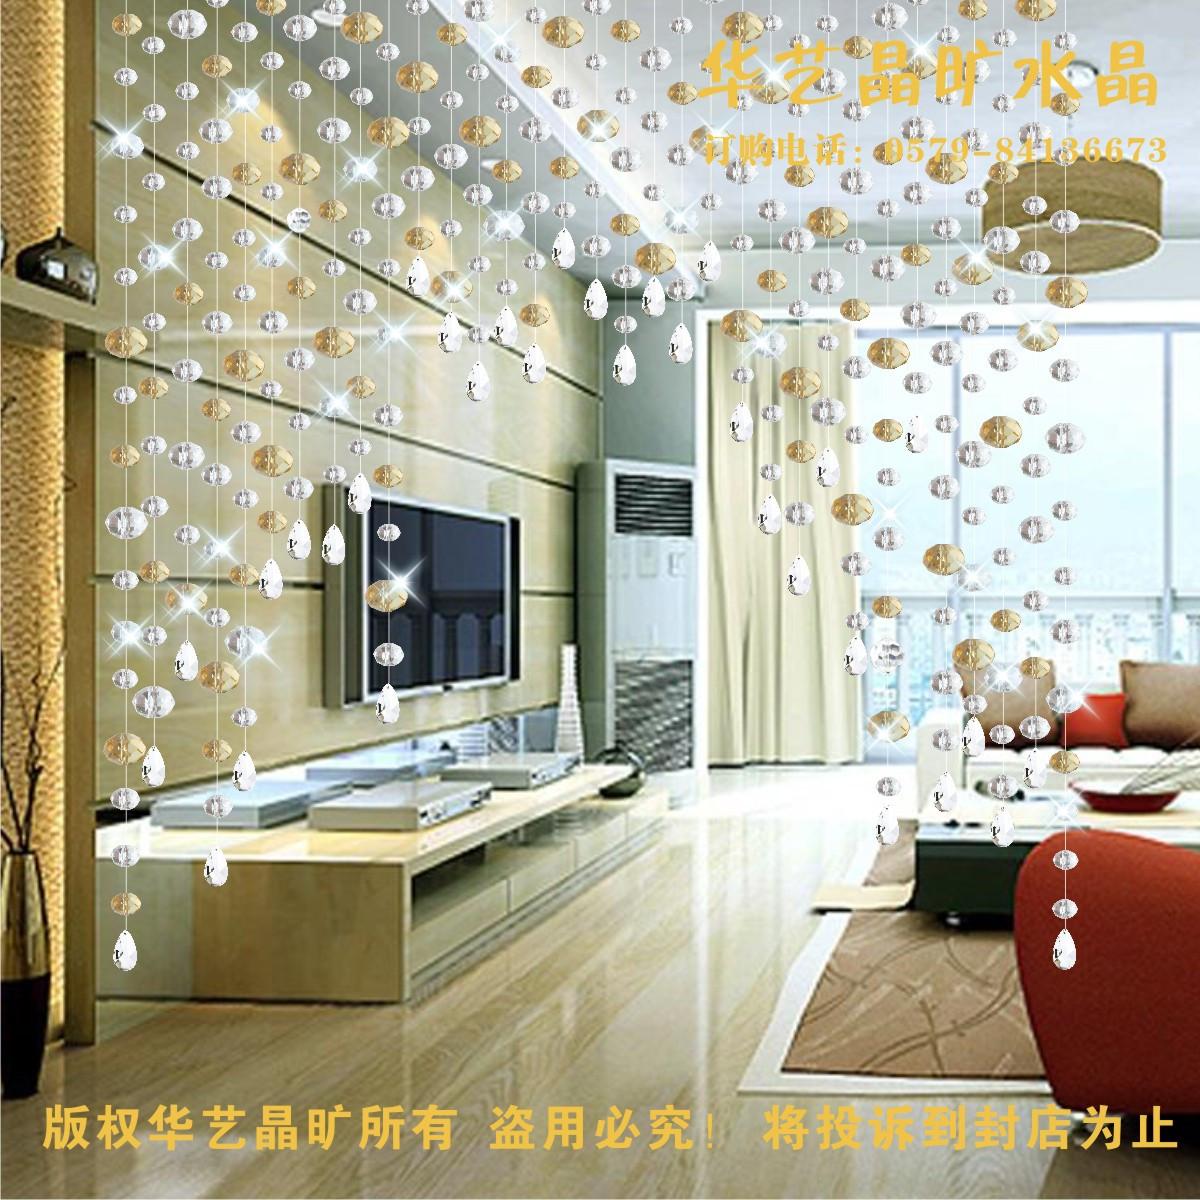 Rideau rideau de perles de cristal produit un rideau de - Rideau de perles ikea ...